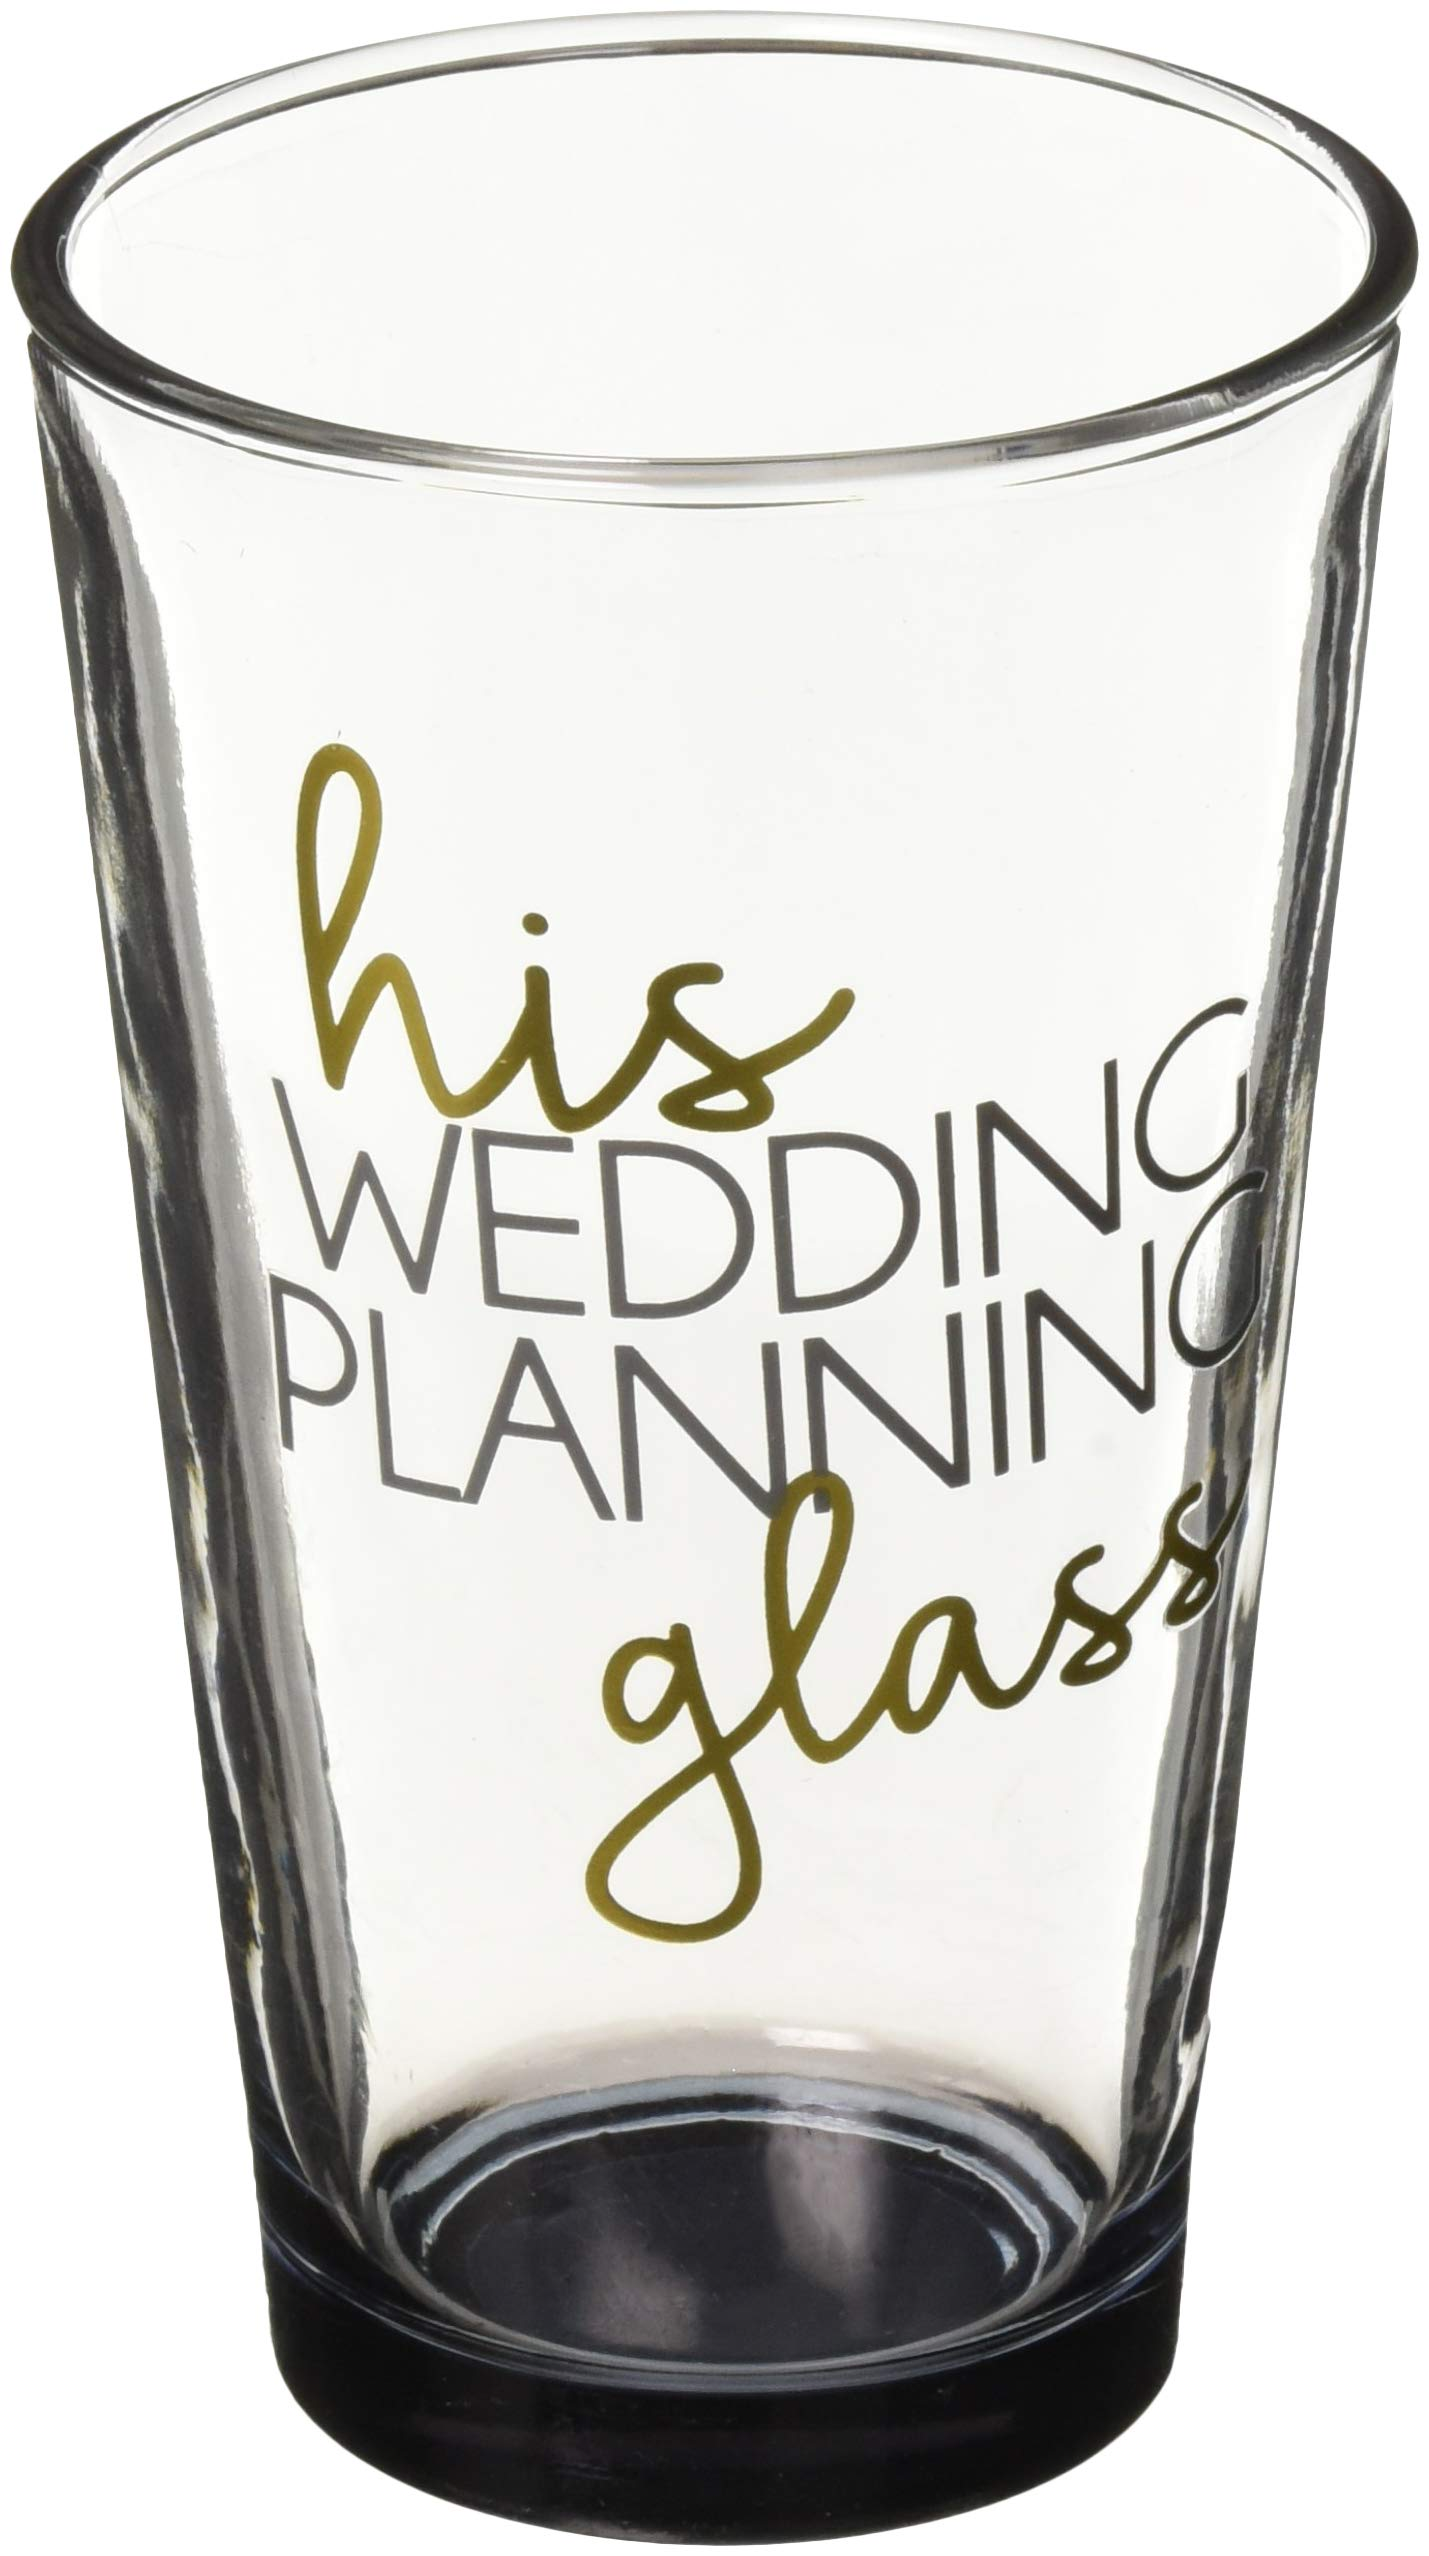 Pavilion Gift Company 61139 His Wedding Planning Glass-16 oz 16 oz Pint Glass Tumbler, Black